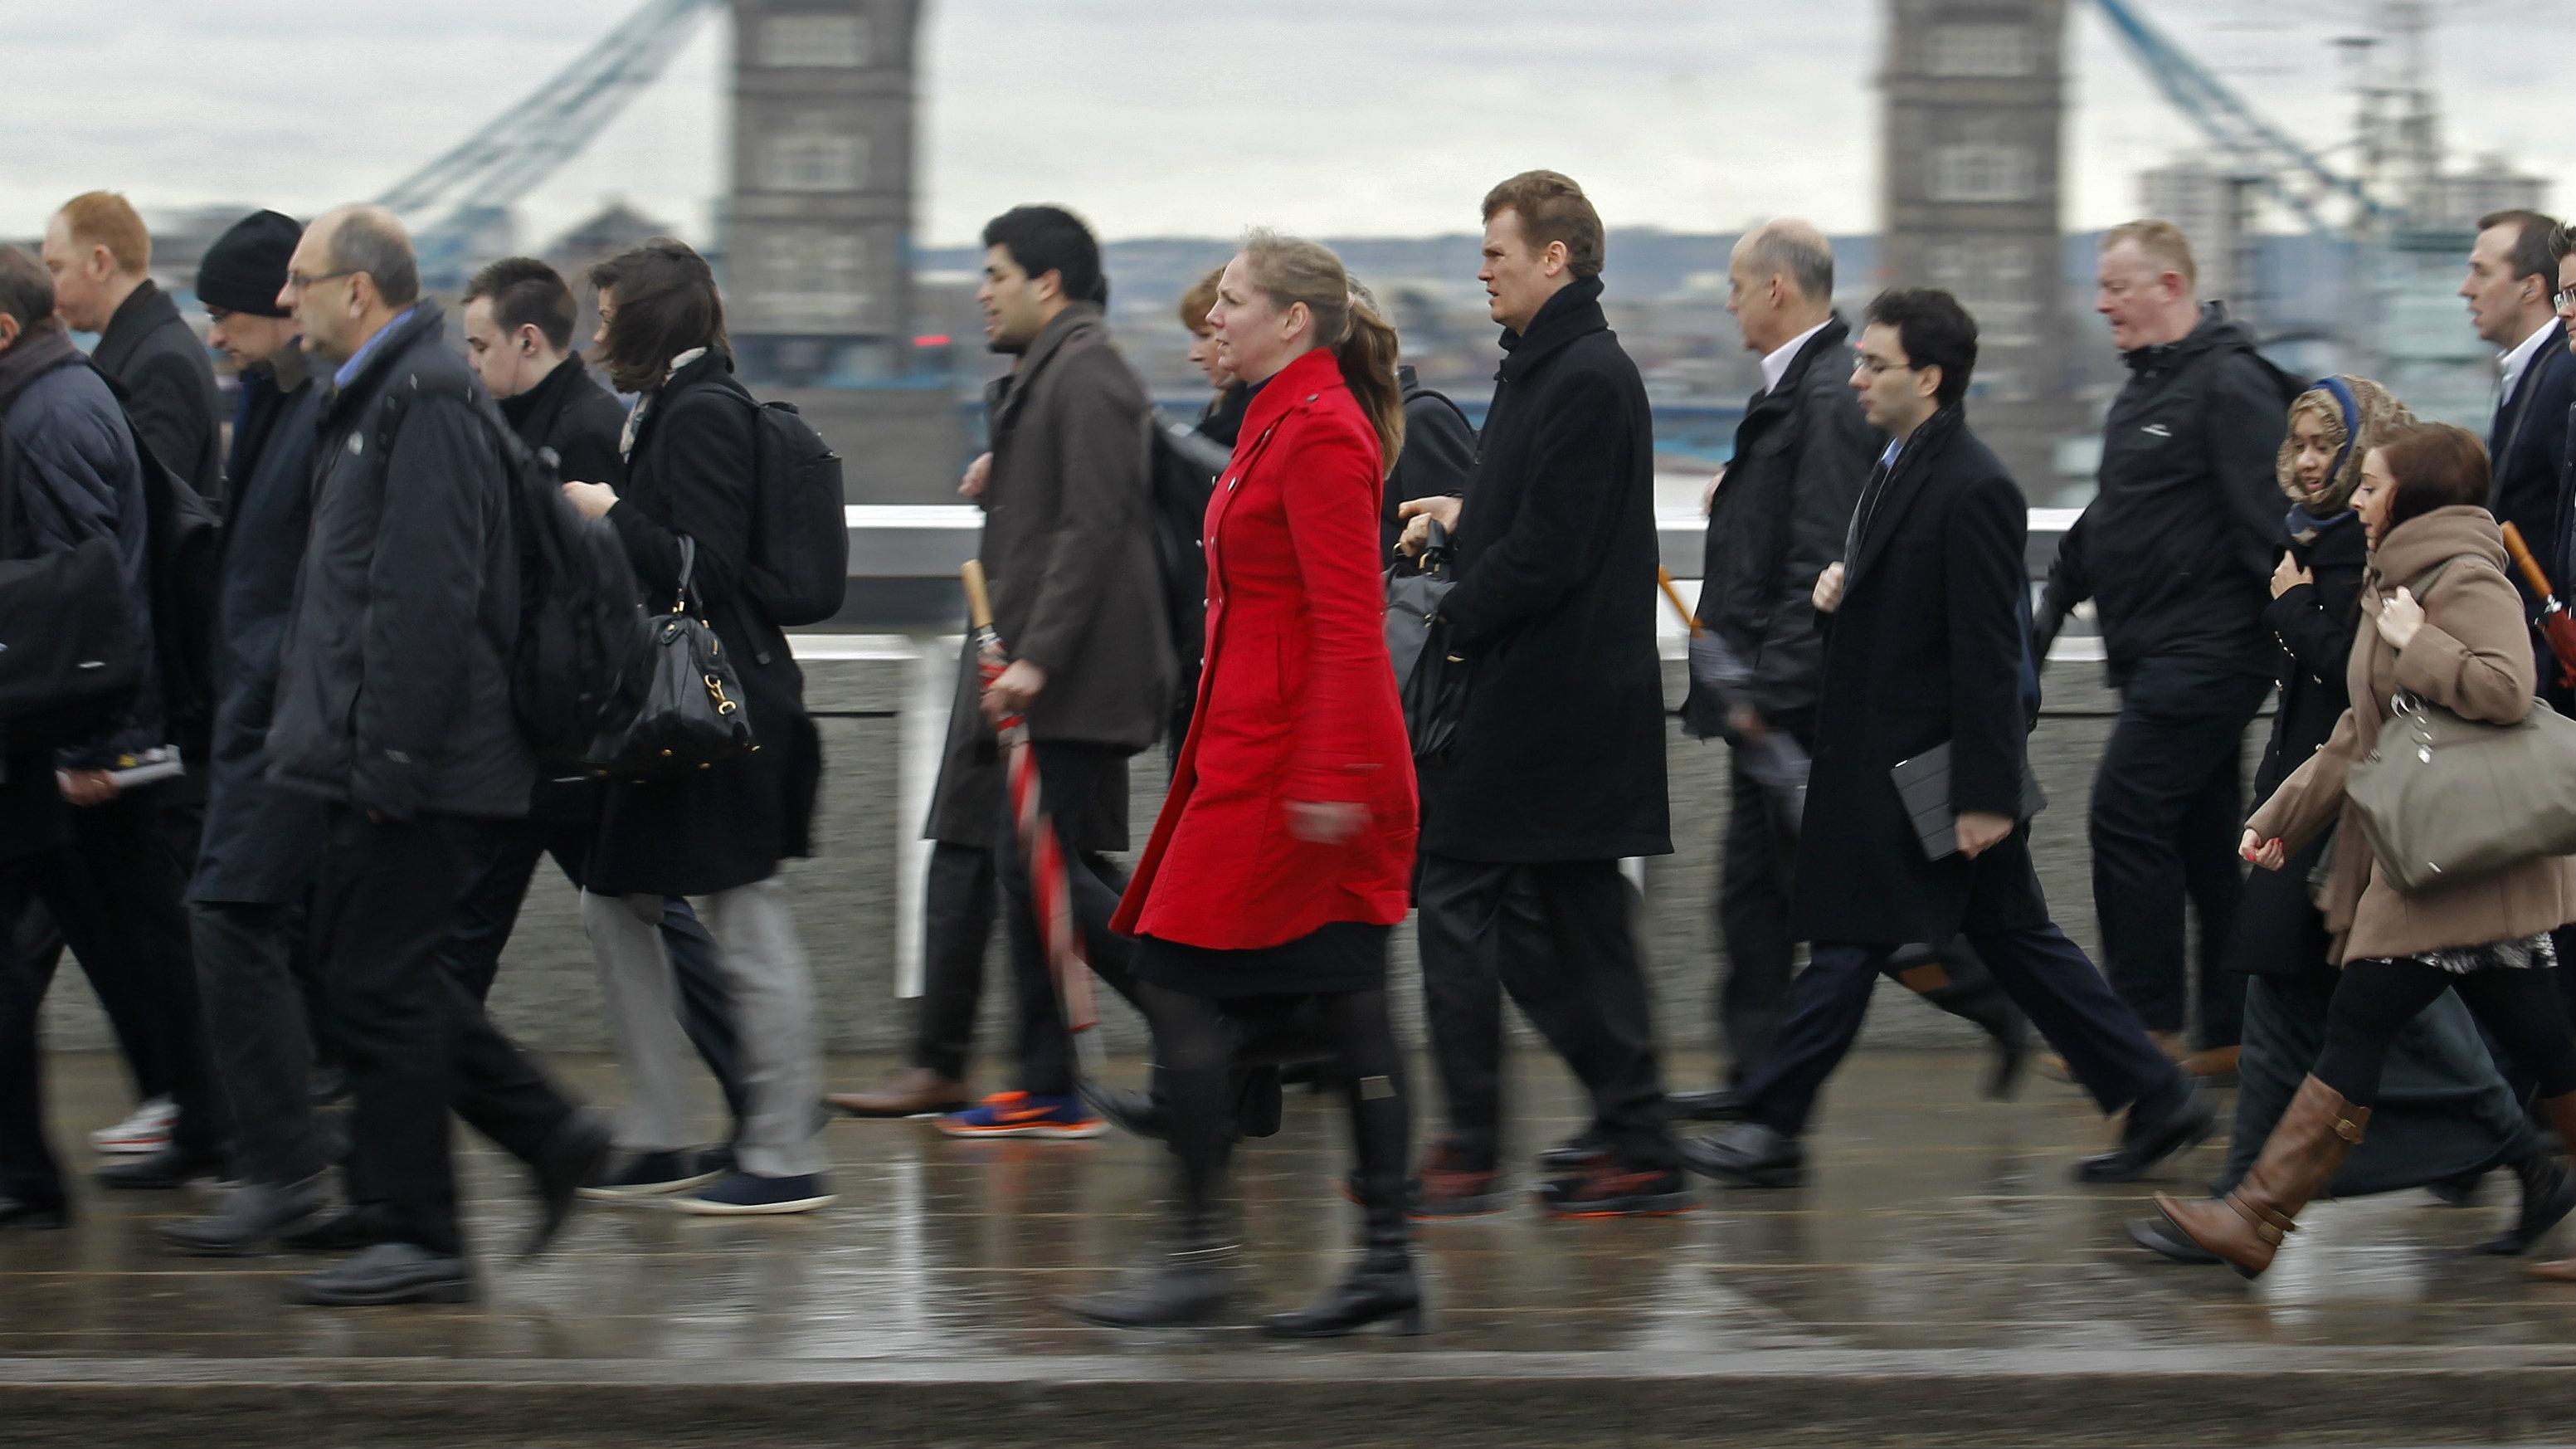 Commuters crossing London Bridge on way to work.